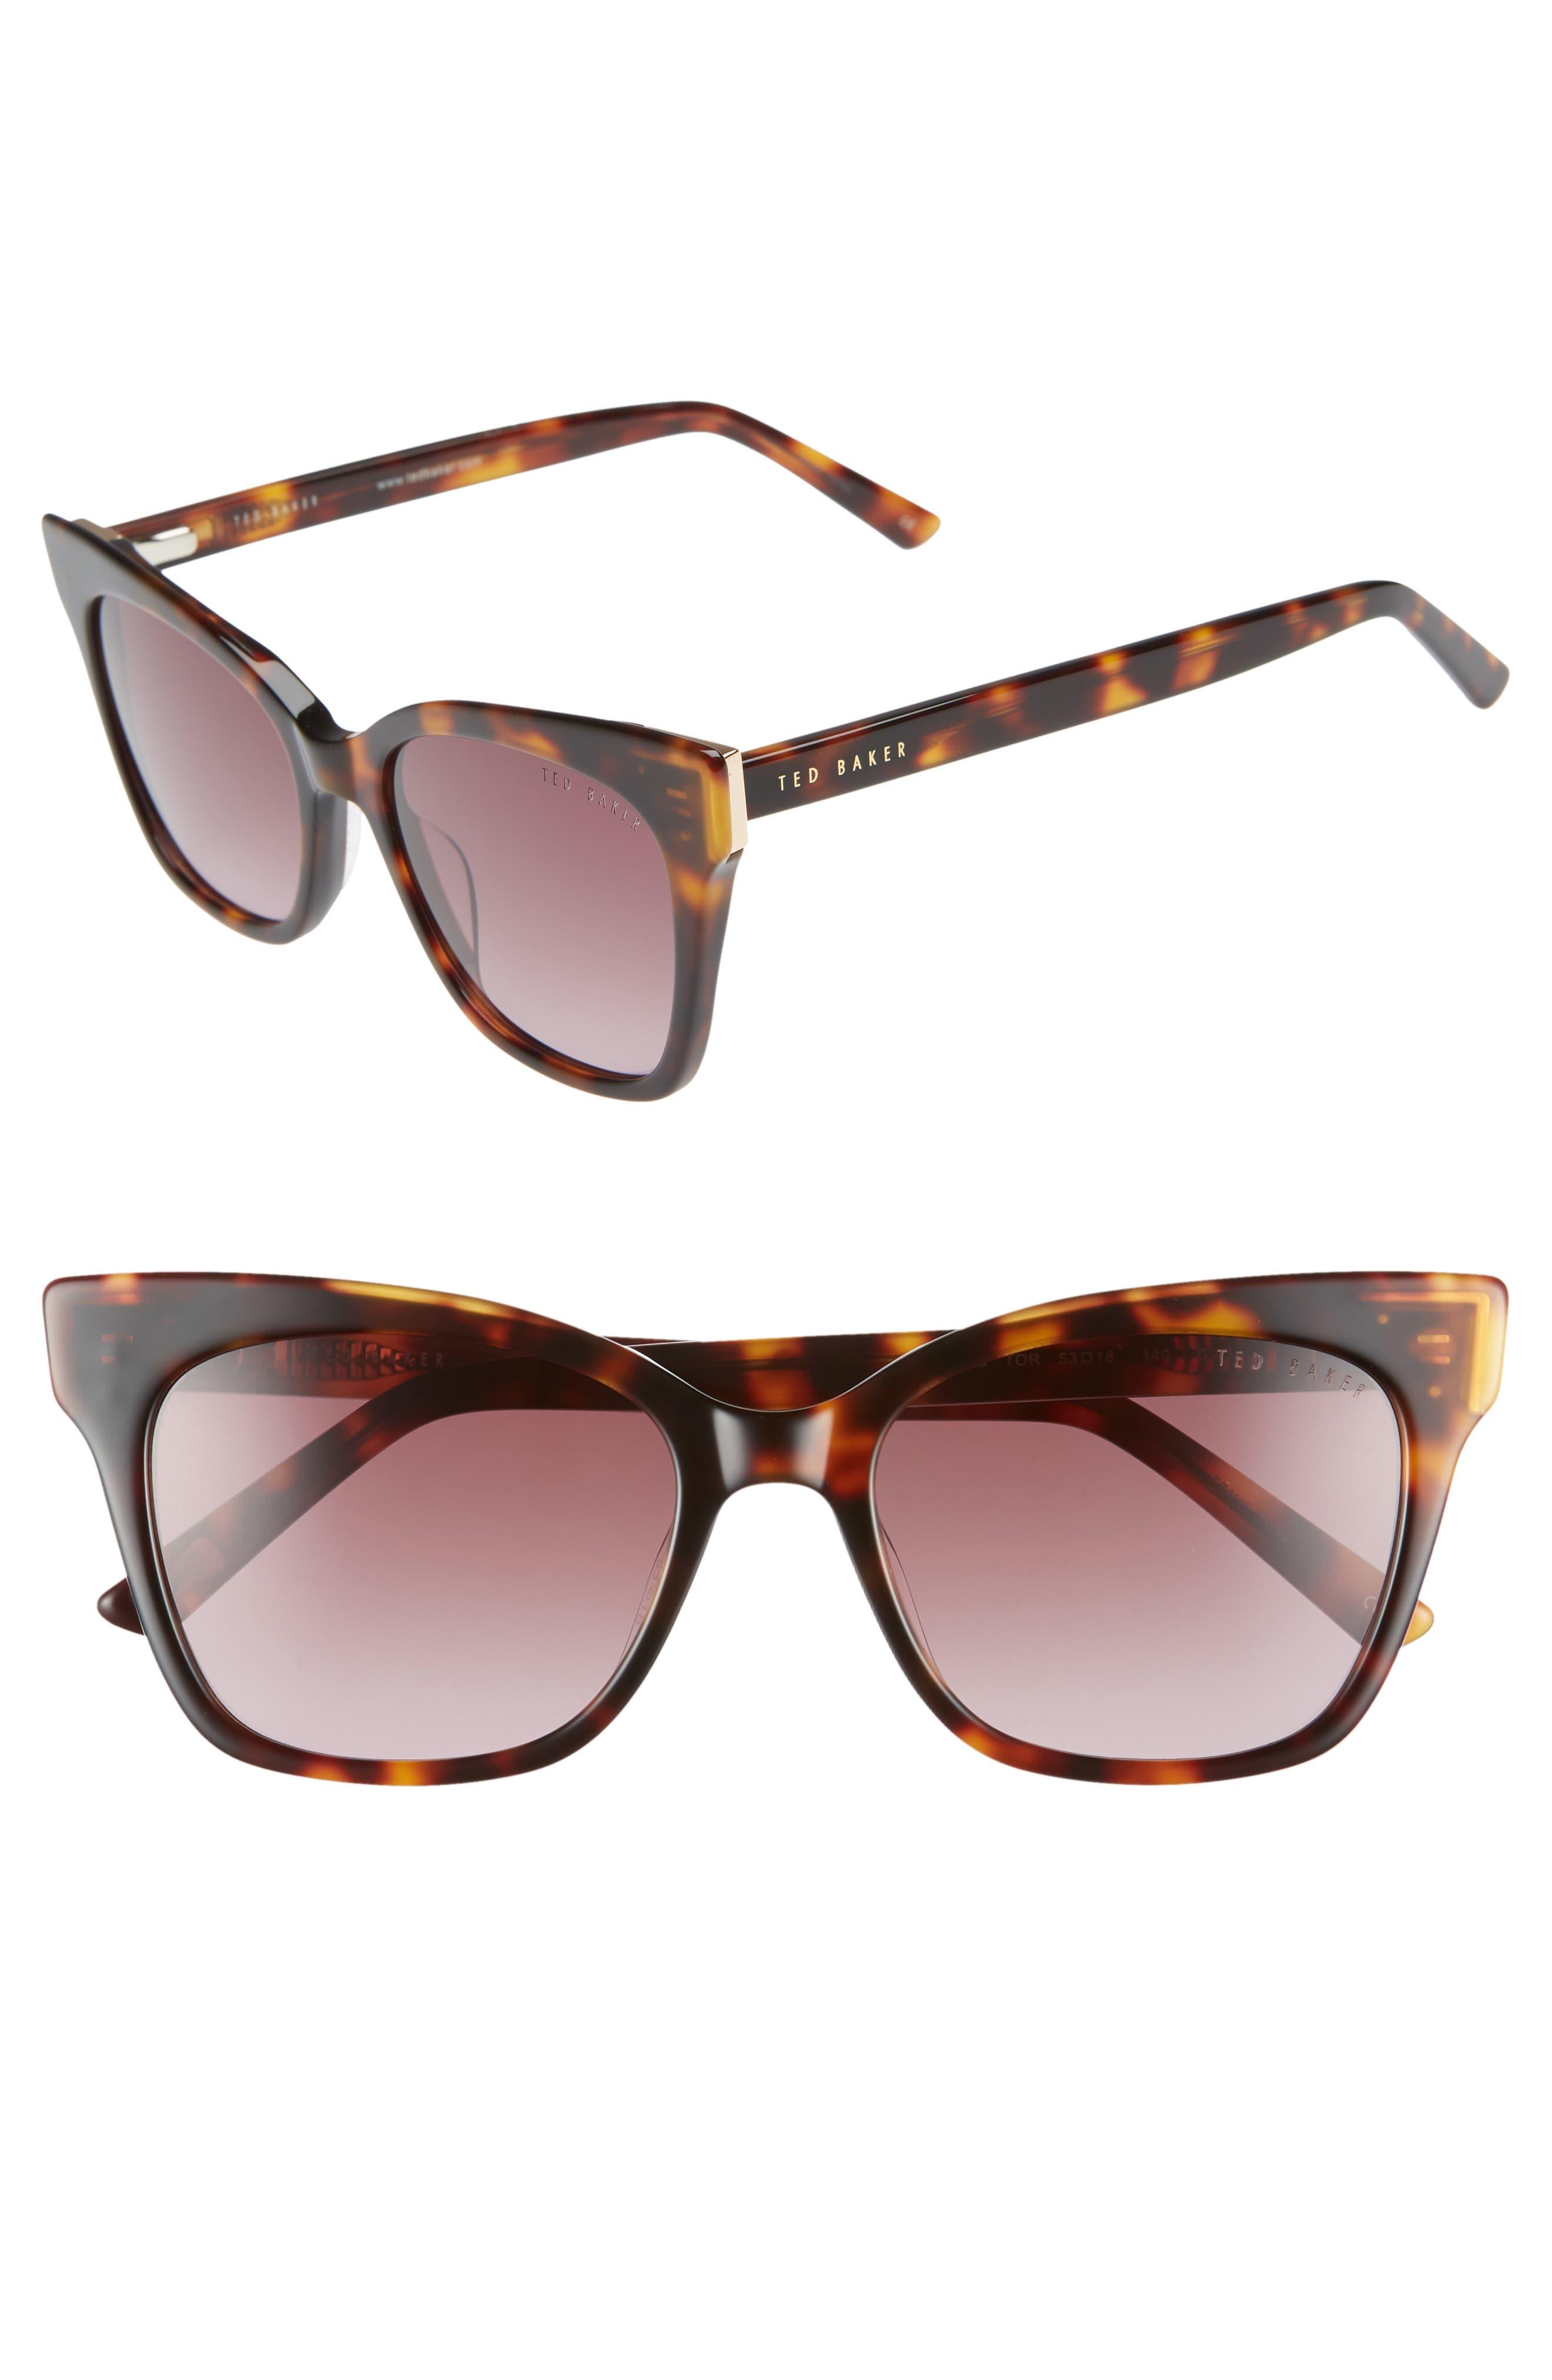 53mm Square Cat Eye Sunglasses,                         Main,                         color, TORTOISE